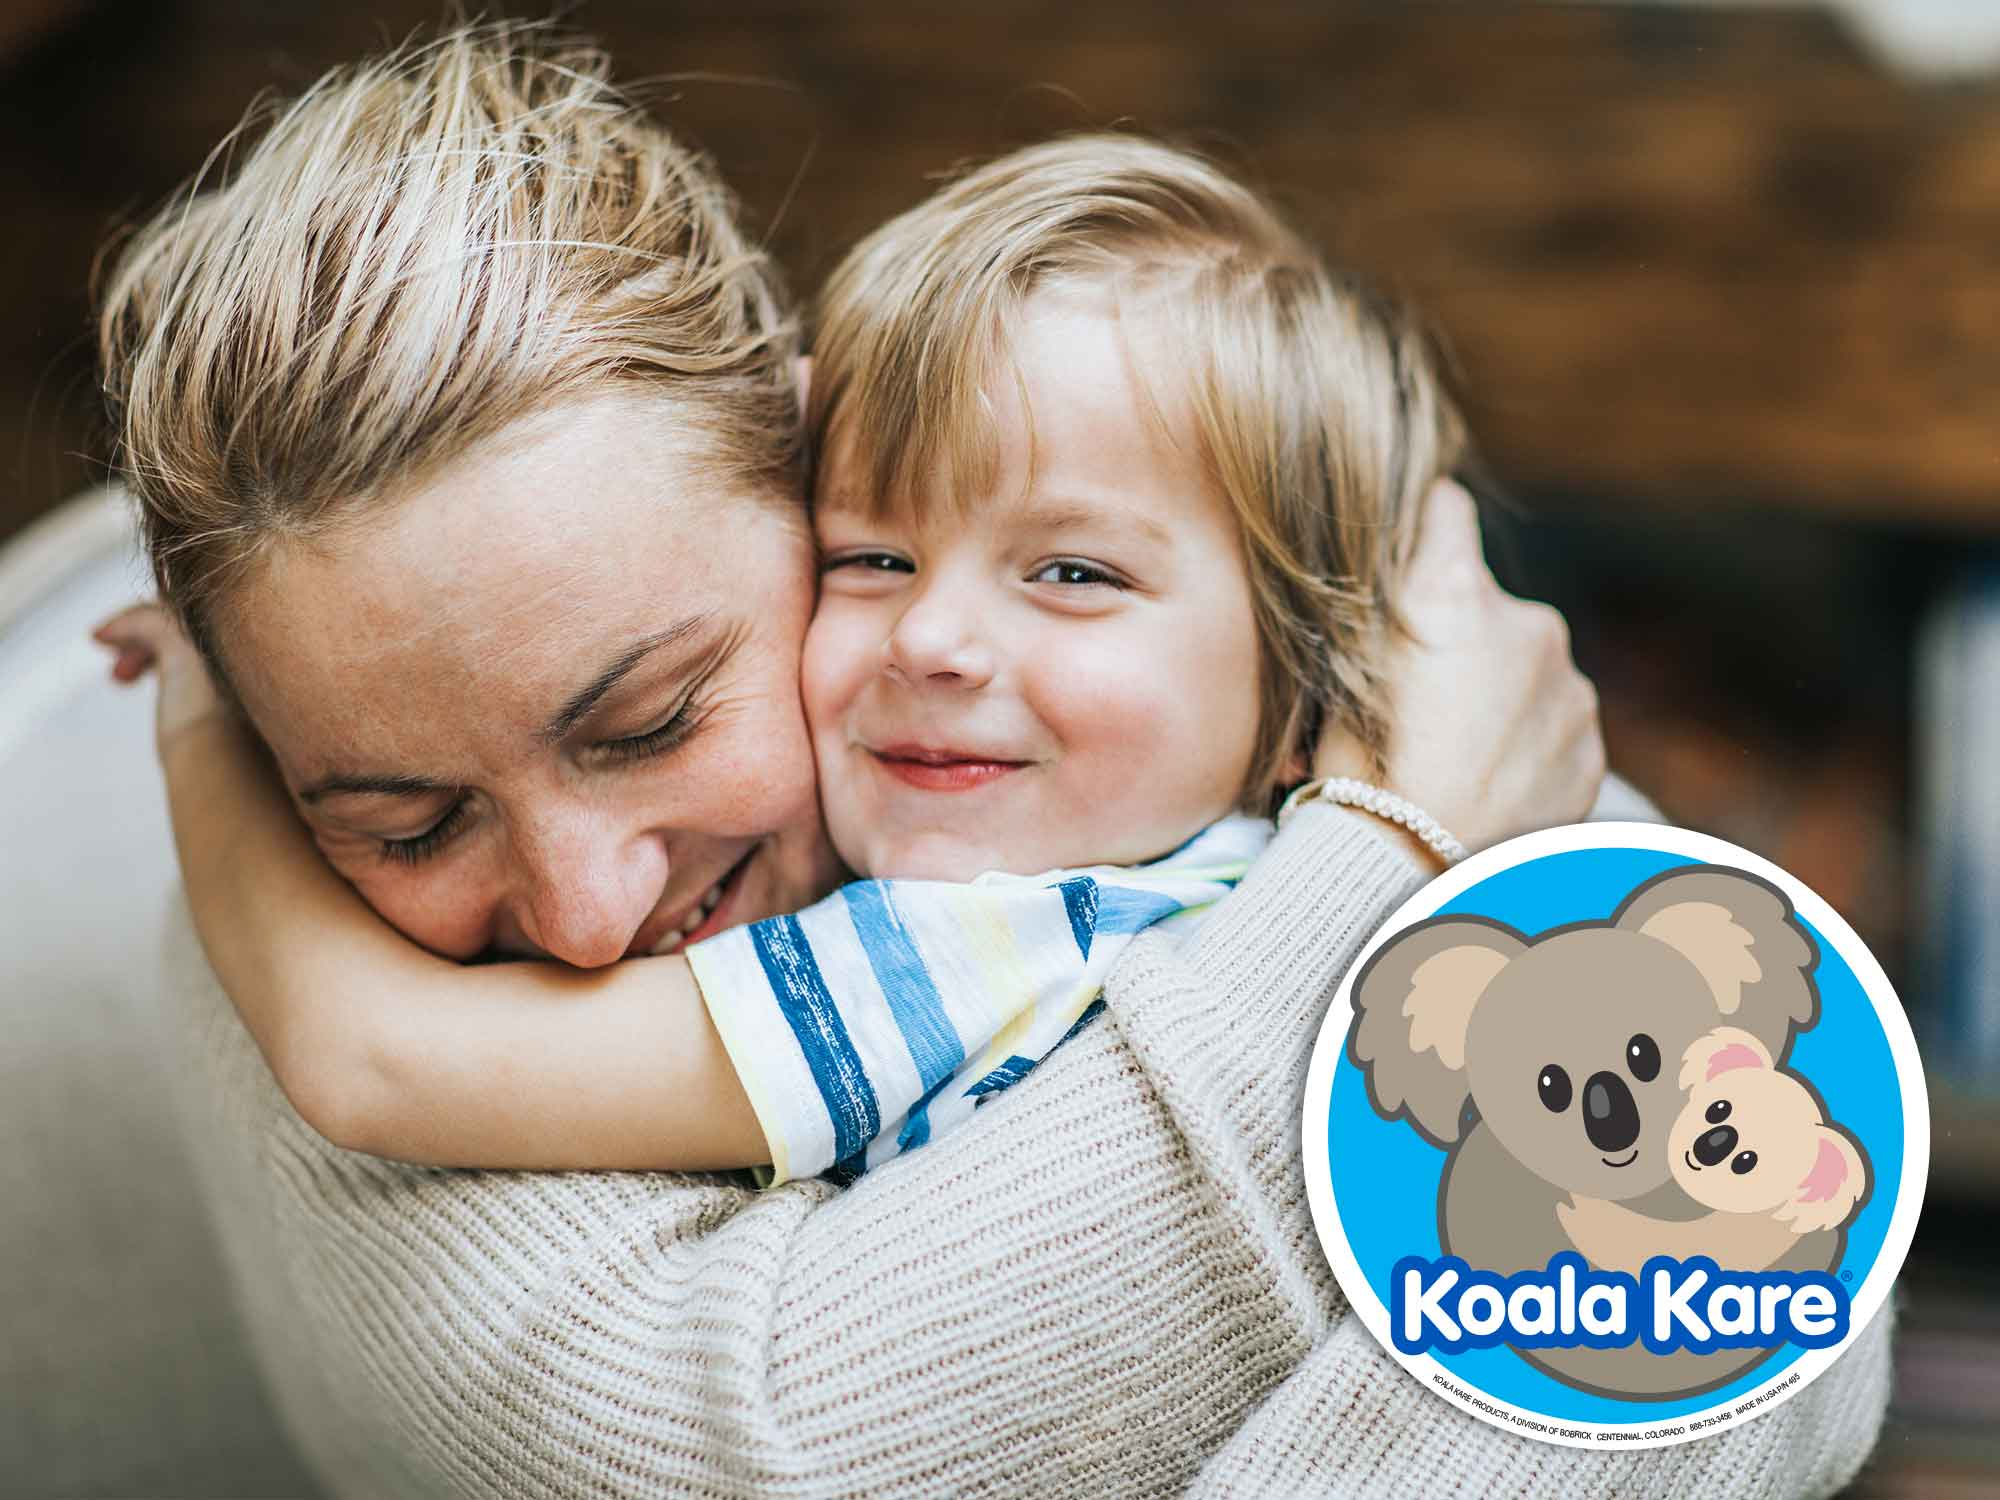 Koala Kare Infant Products : creating a platform for change